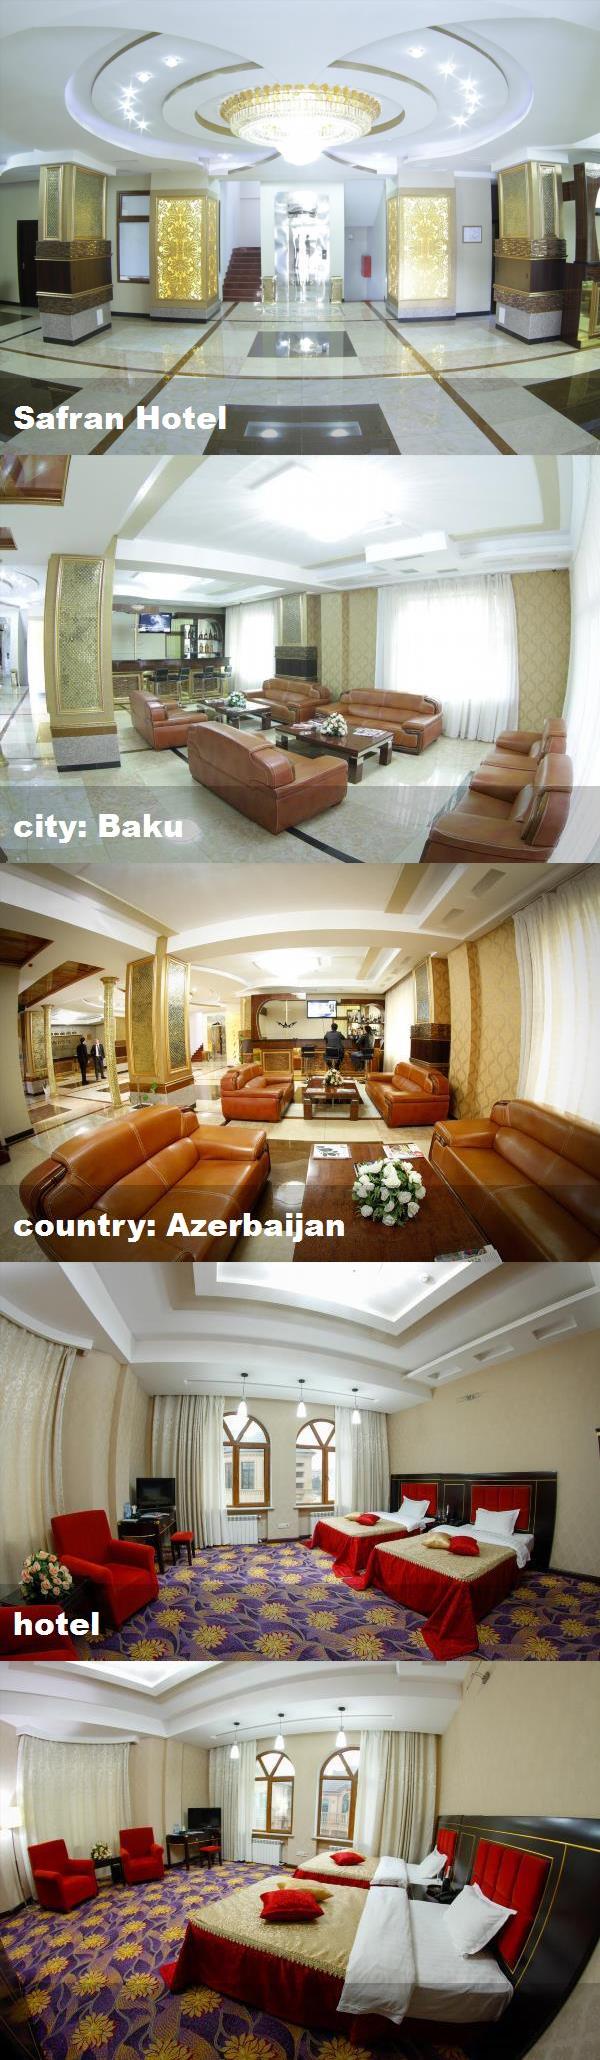 Safran Hotel City Baku Country Azerbaijan Hotel Hotel Azerbaijan House Styles